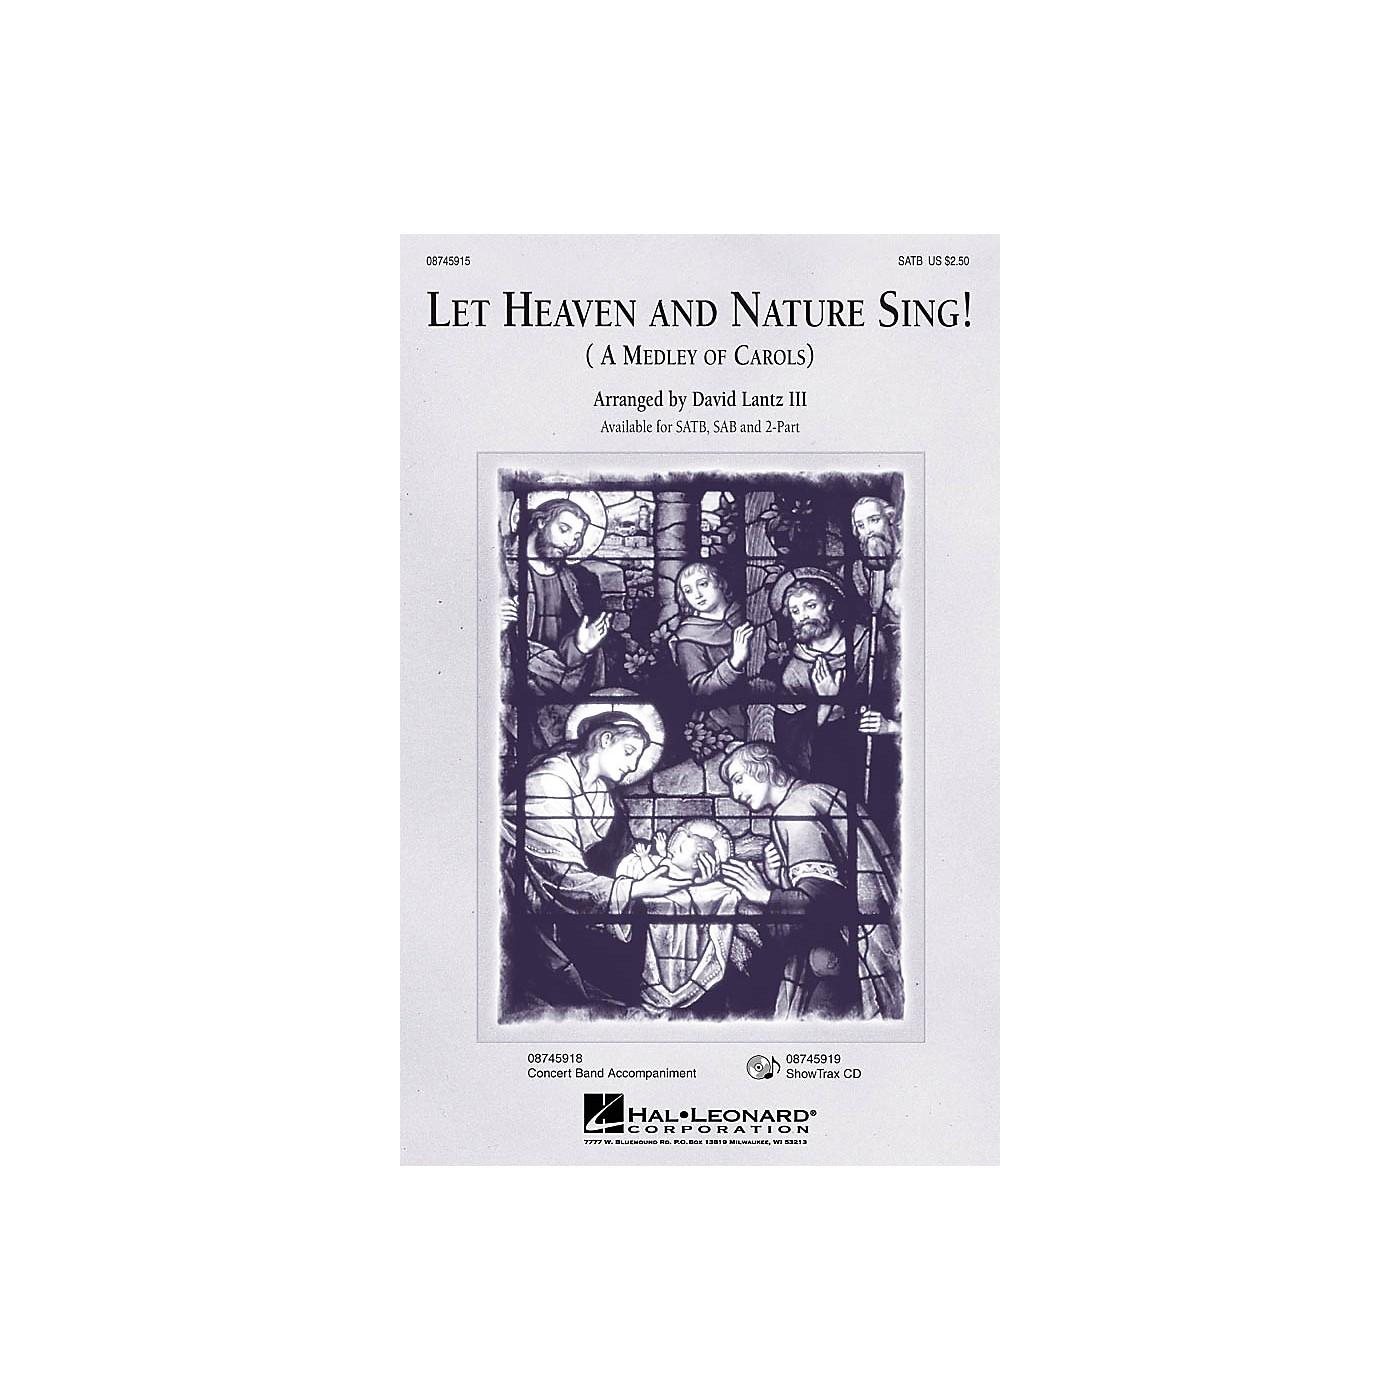 Hal Leonard Let Heaven and Nature Sing! ShowTrax CD Arranged by David Lantz III thumbnail